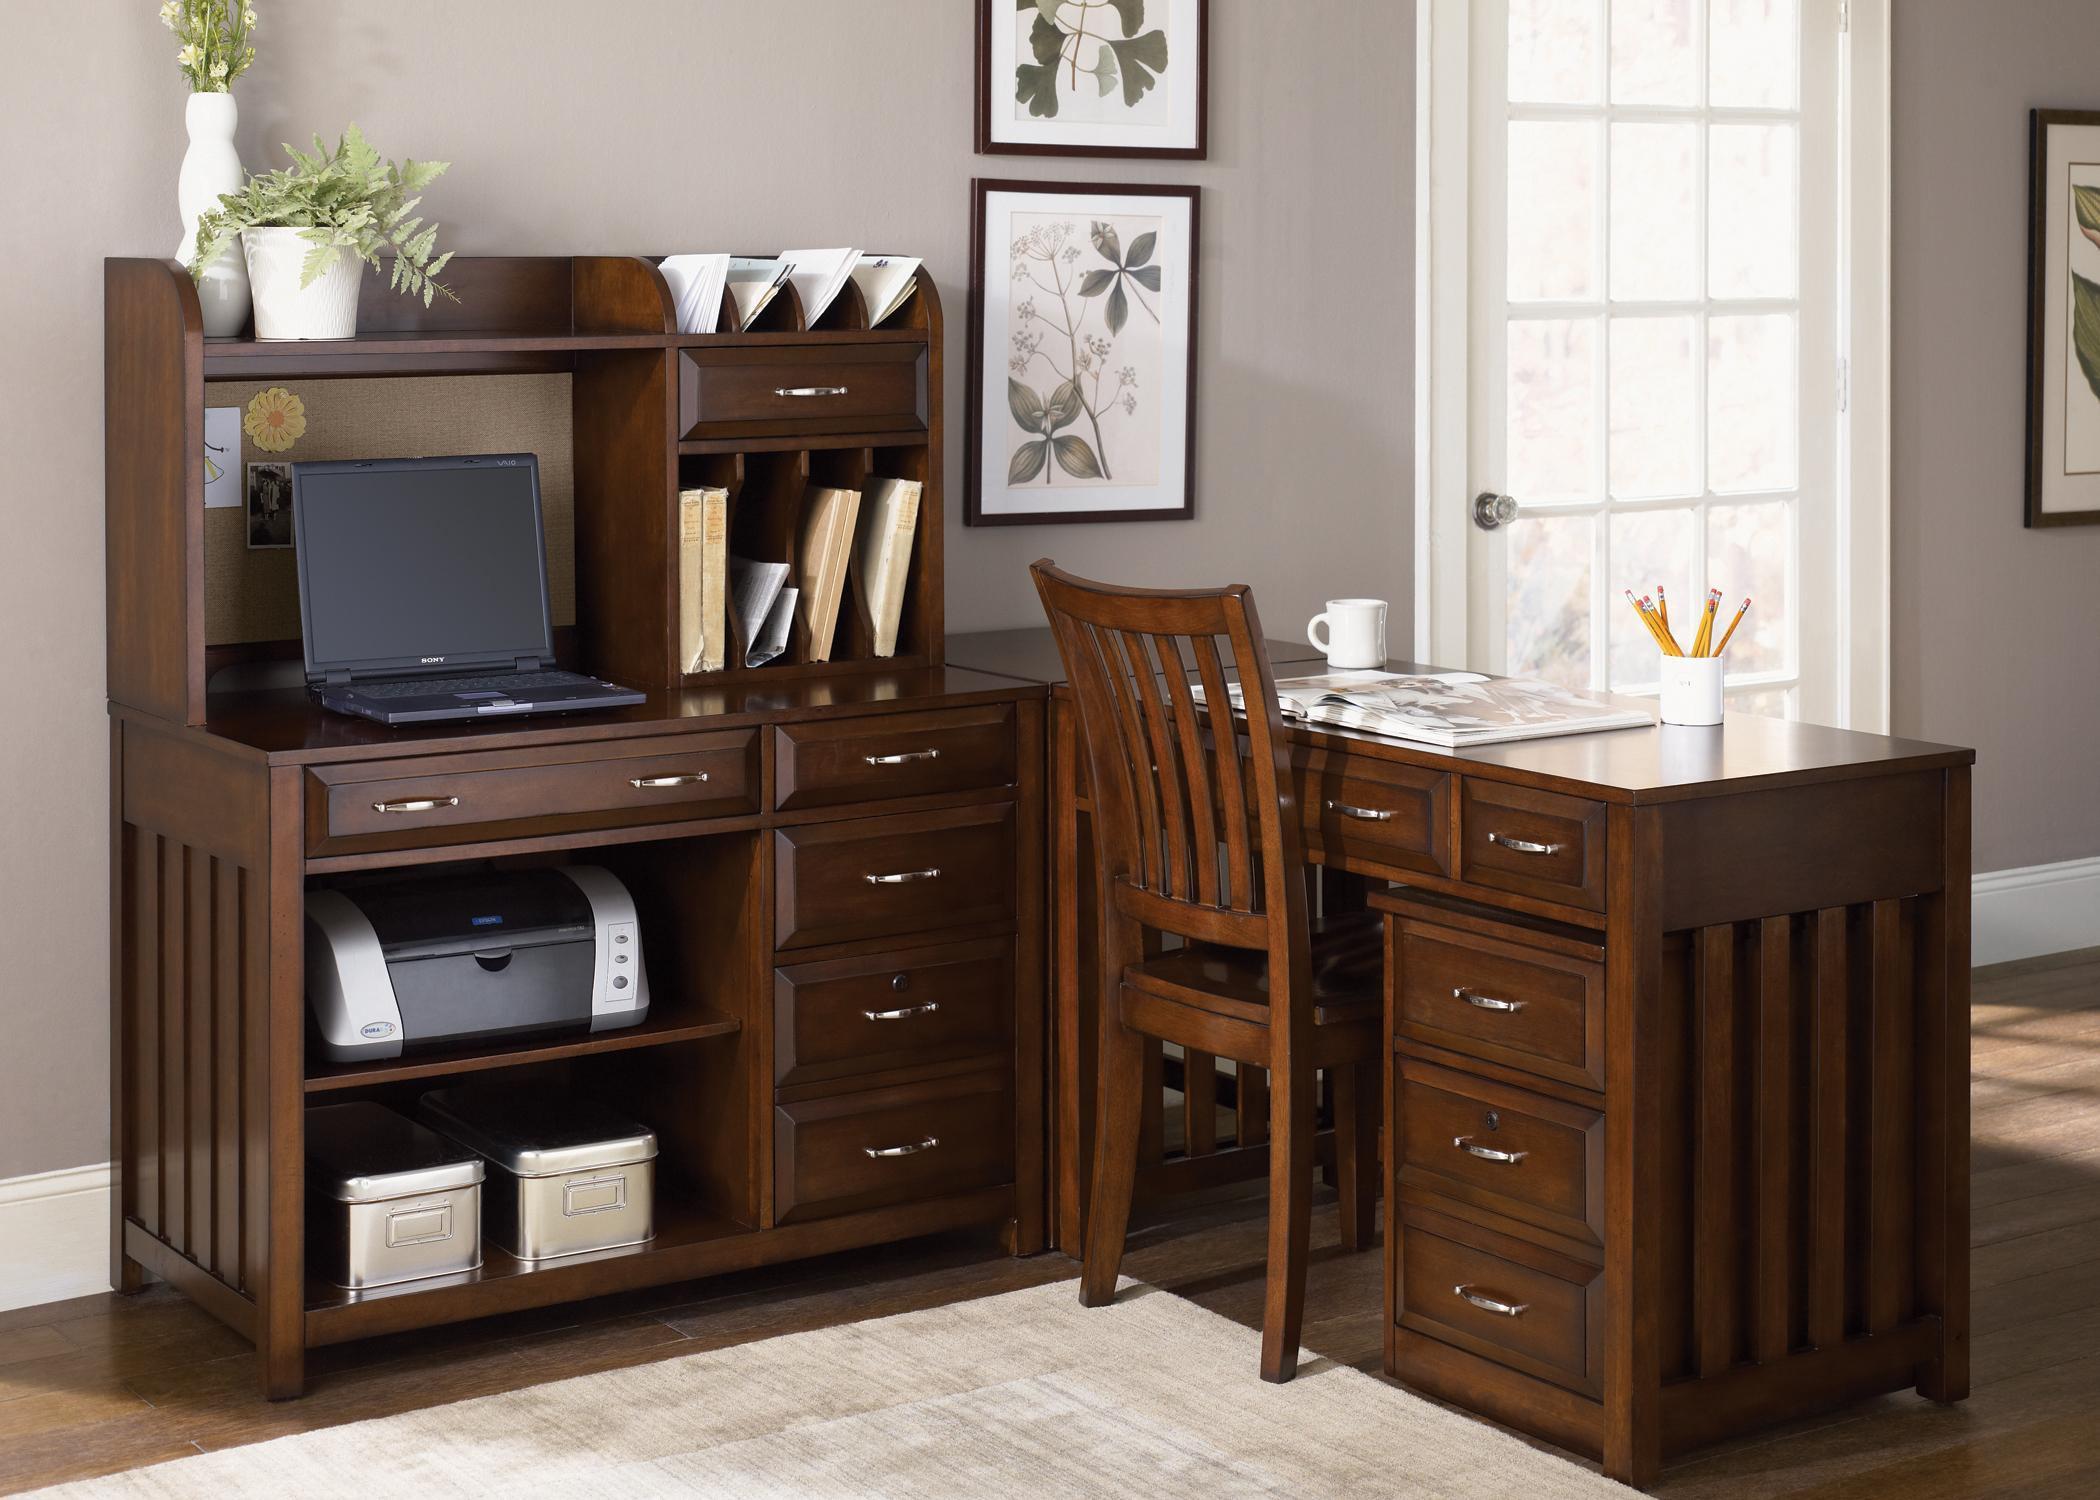 Liberty Furniture Hampton Bay Writing Desk With Drawers Wayside